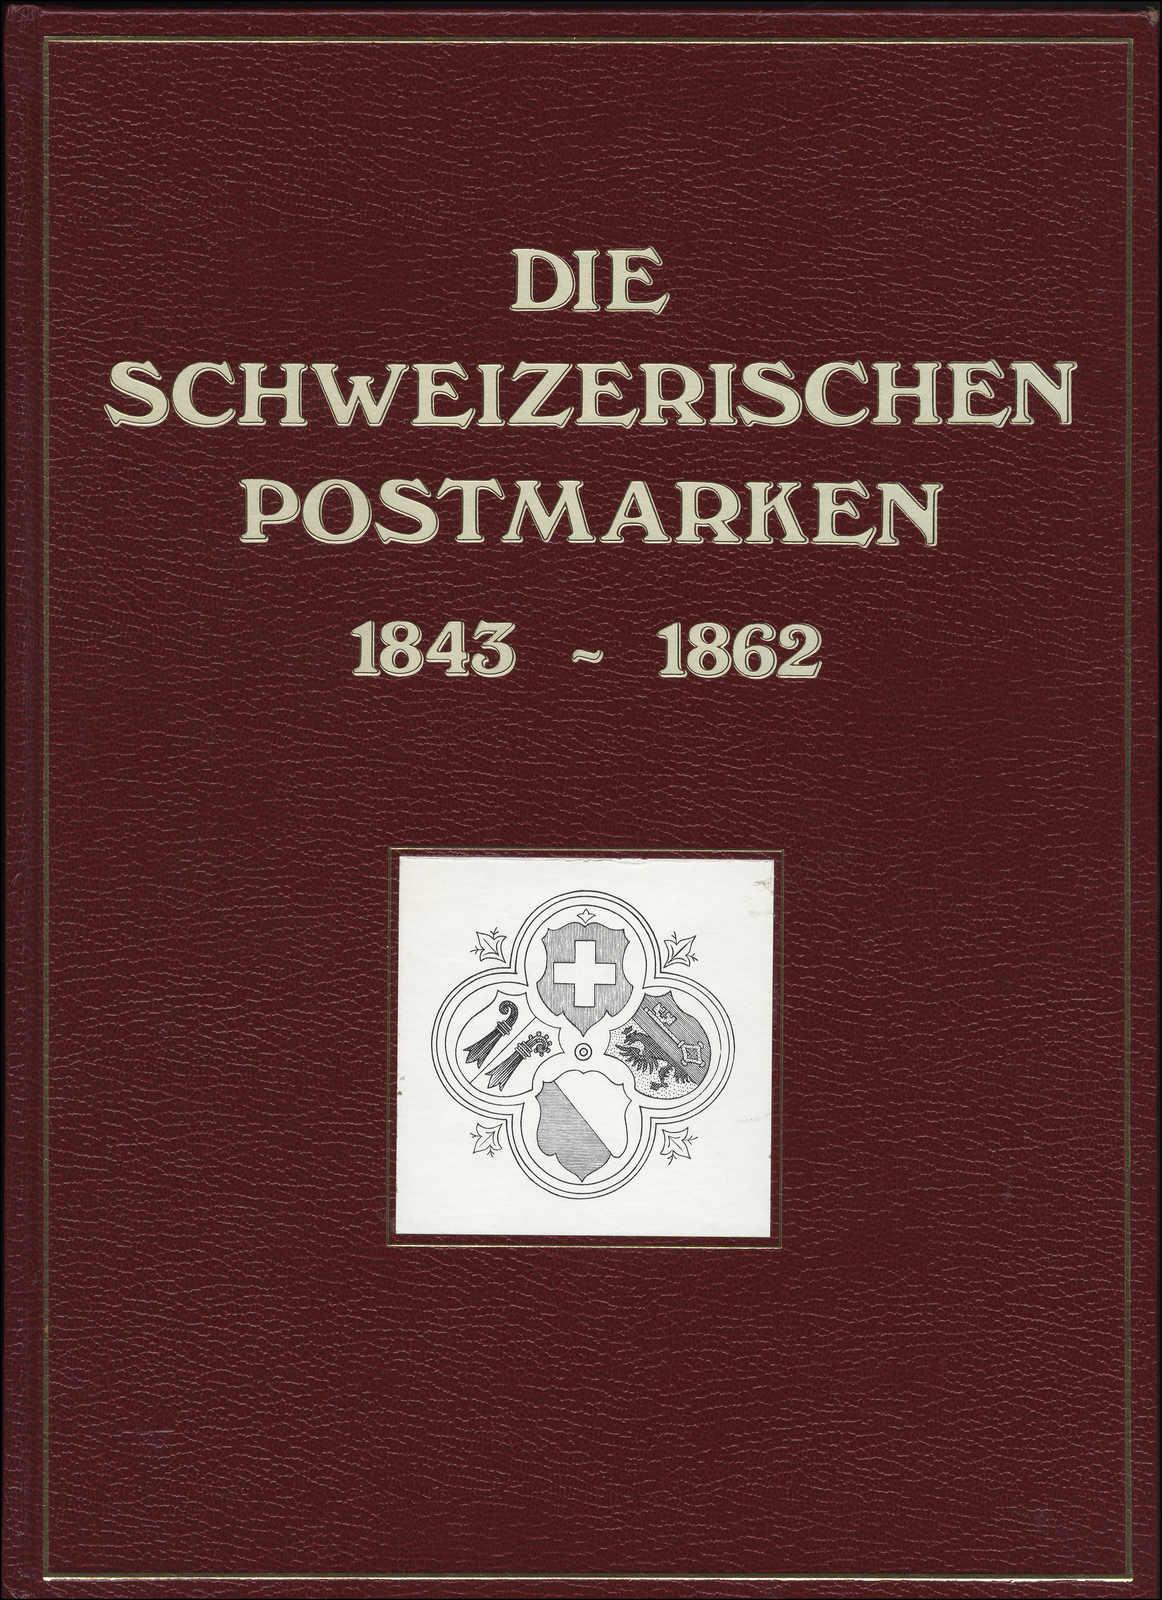 Lot 1522 - sonstiges sonstiges -  Rolli Auctions Auction #68 Day 2